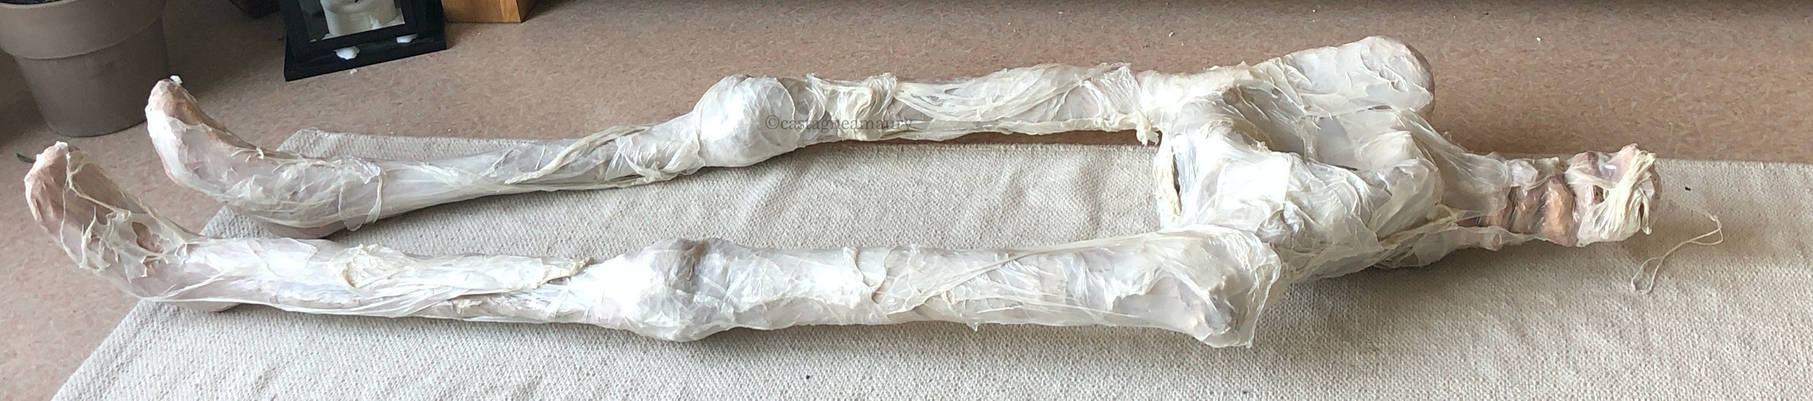 skeleton-skin-plastic-castagne-amaury-2.